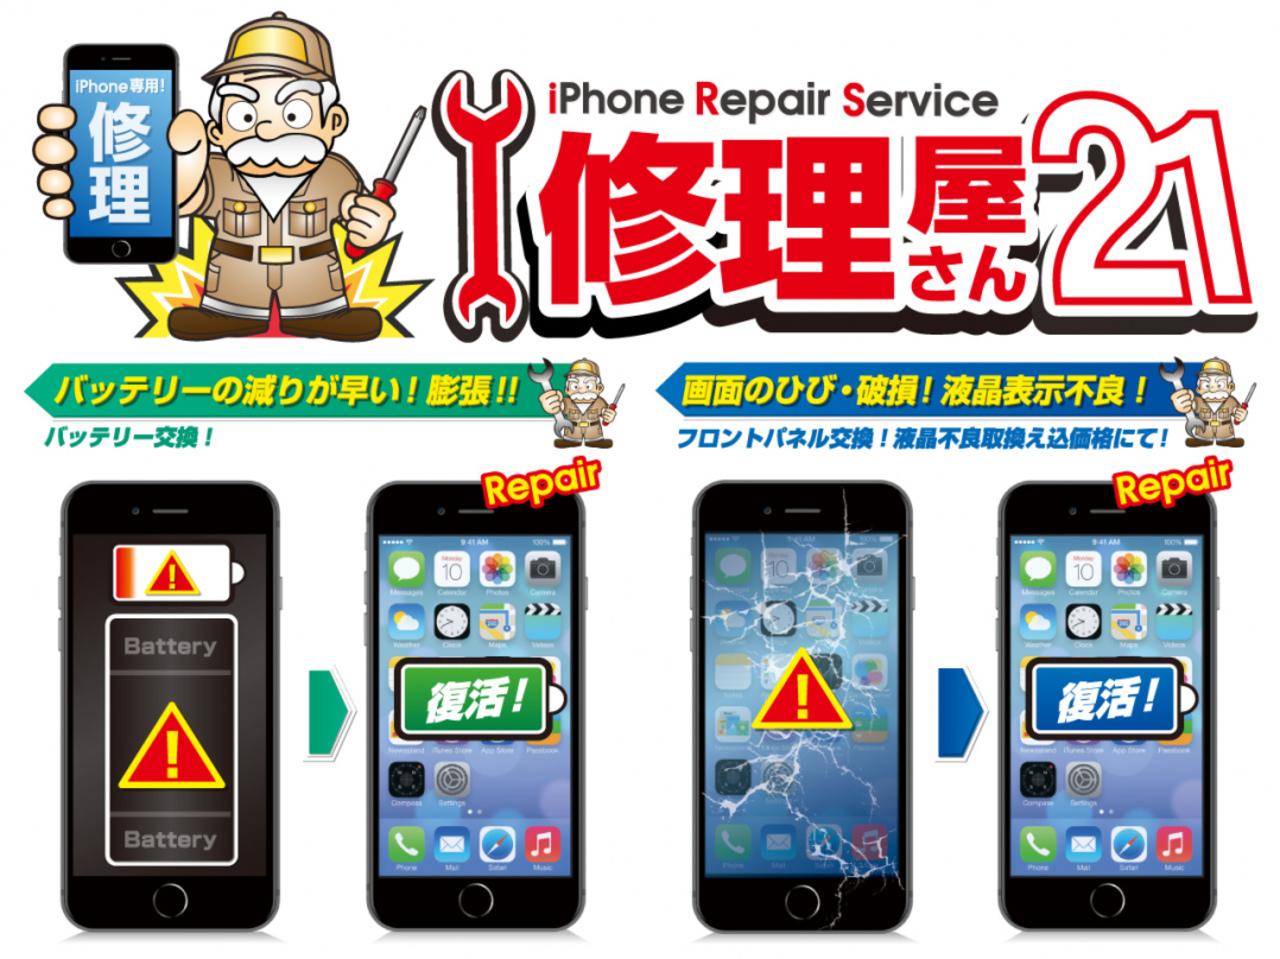 iPhoneバッテリー交換 即日対応|はんこ屋さん21 東古松店